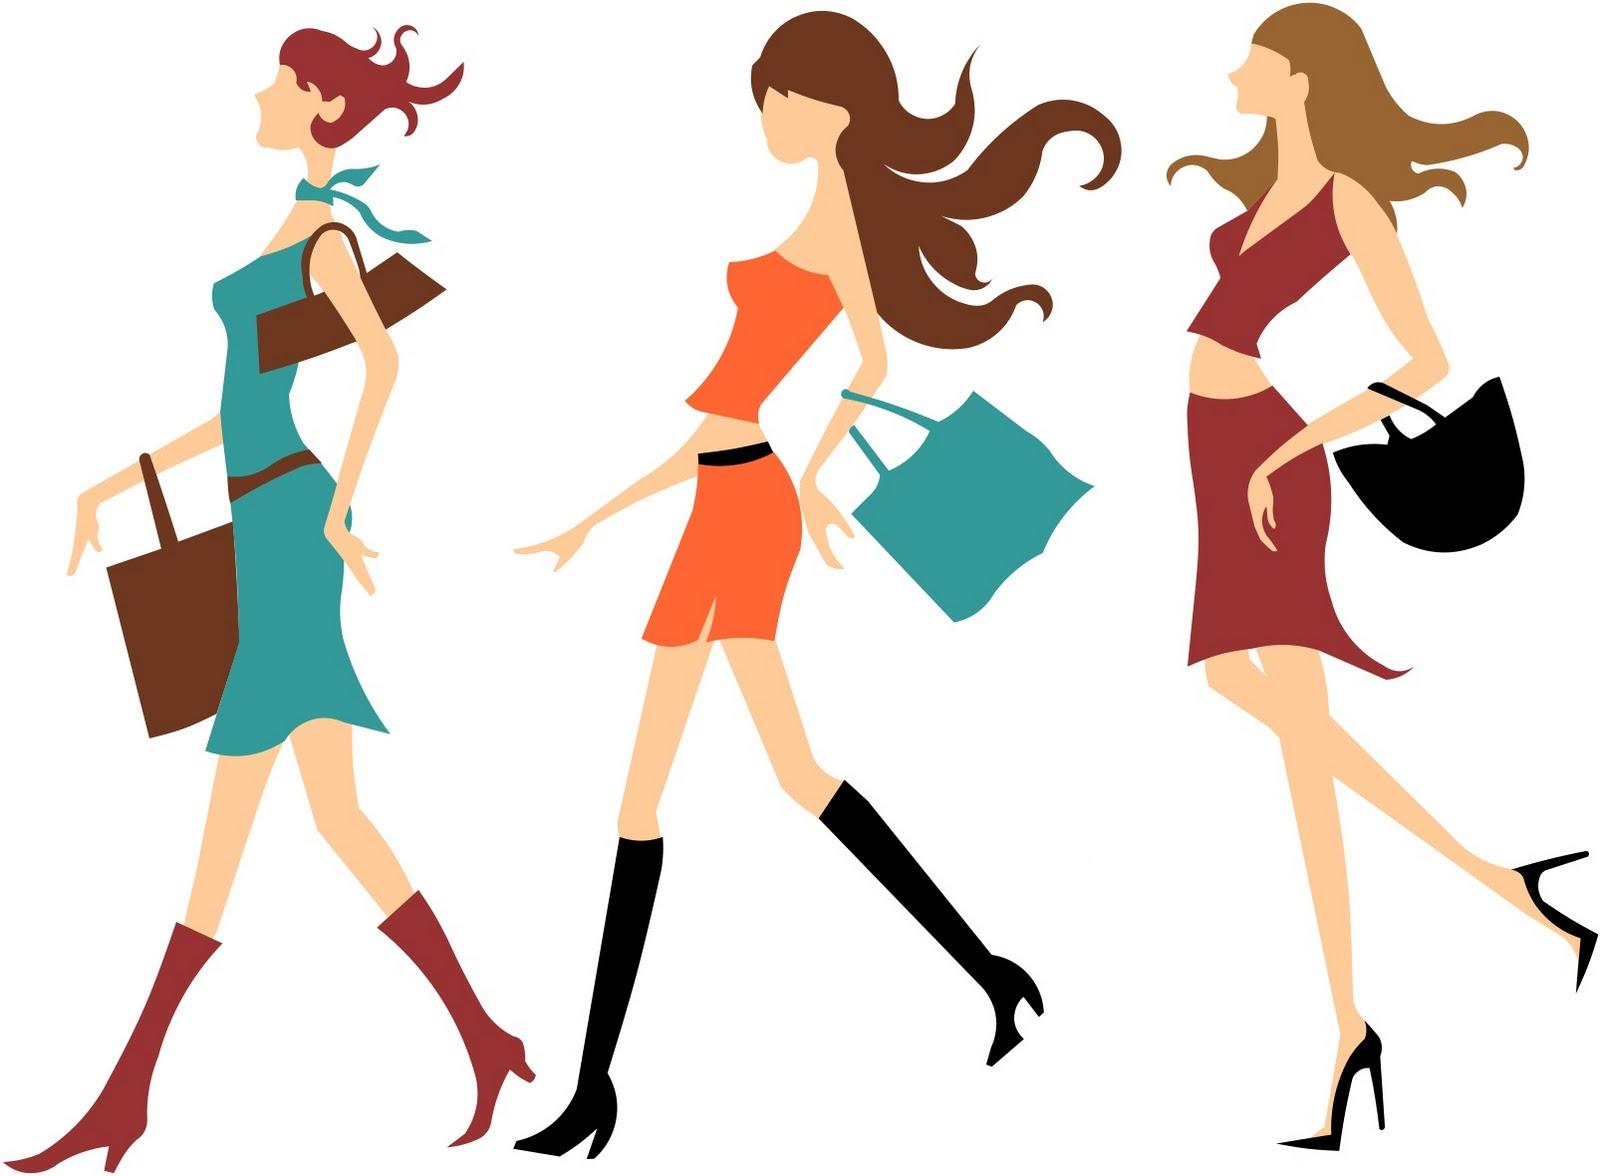 http://1.bp.blogspot.com/-0vRj2xJe6M0/TsrDFbNXumI/AAAAAAAAAOA/D1lUypDc1MA/s1600/shopping_girl_1_2_3.jpg